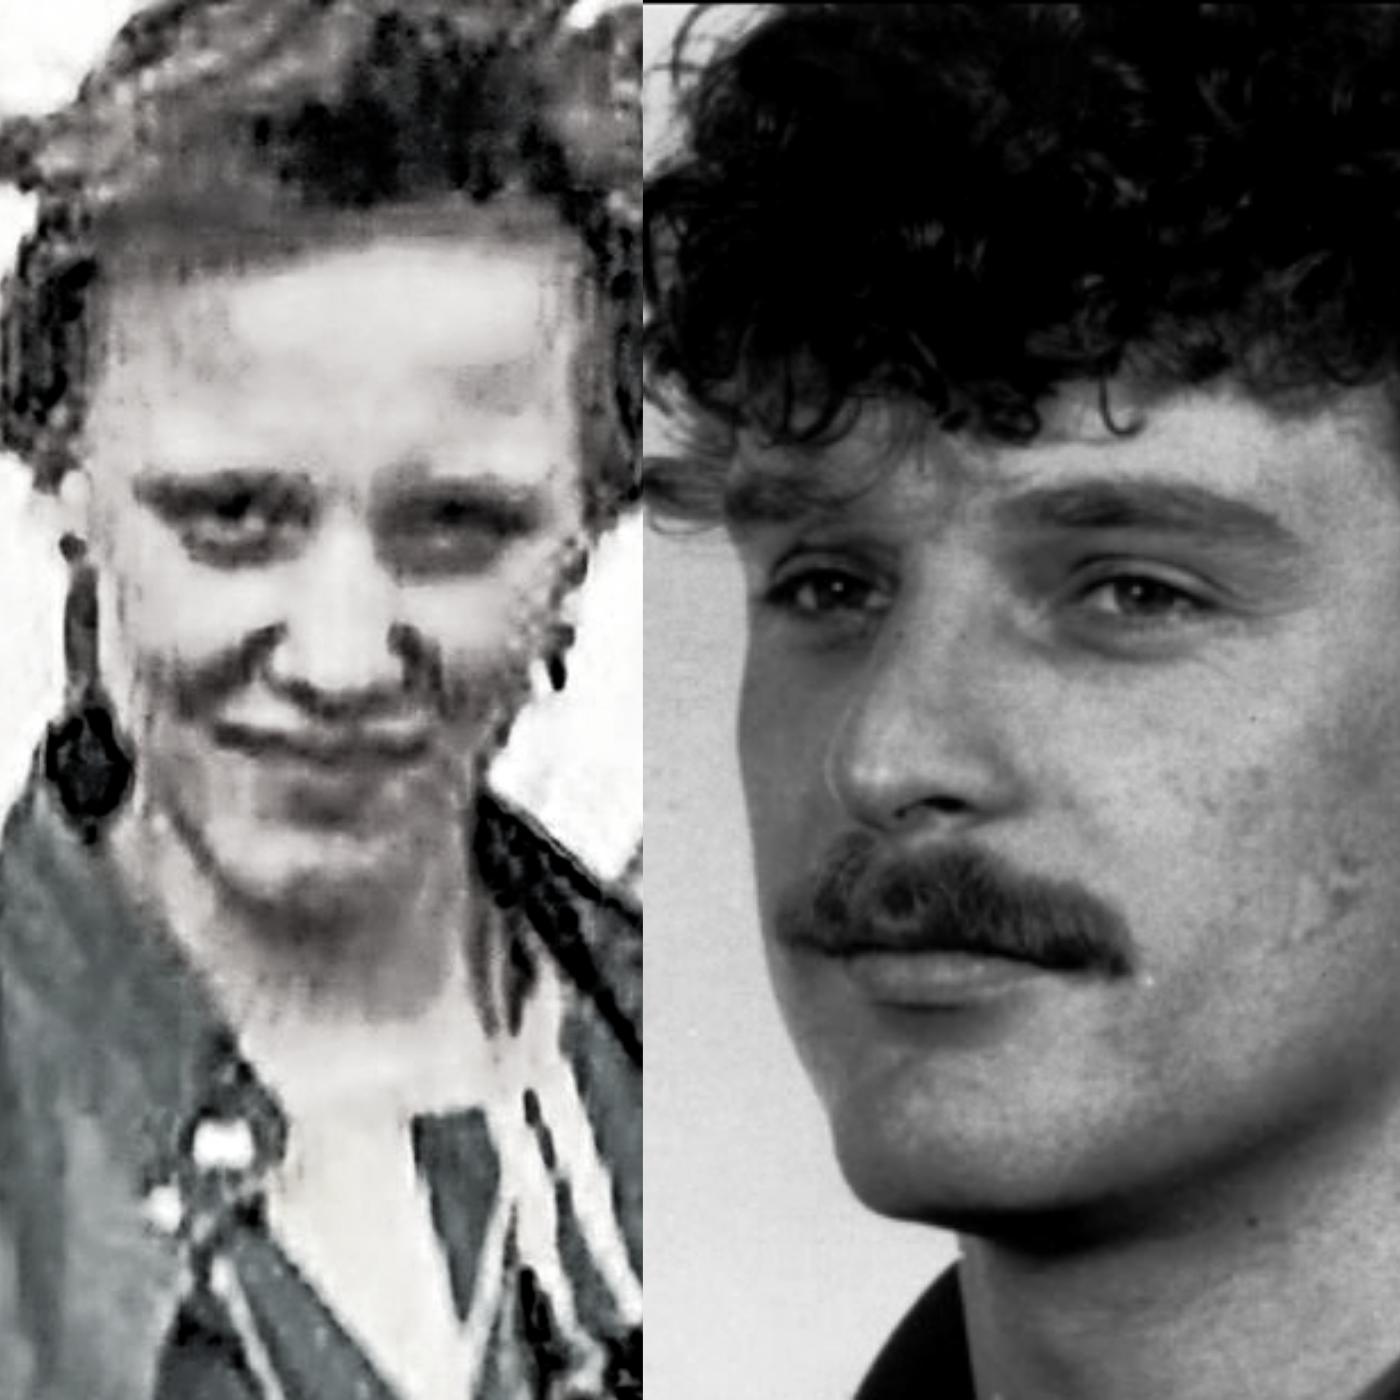 Antoinette Bont & Harry Roo   De Sporttasmoord(en)